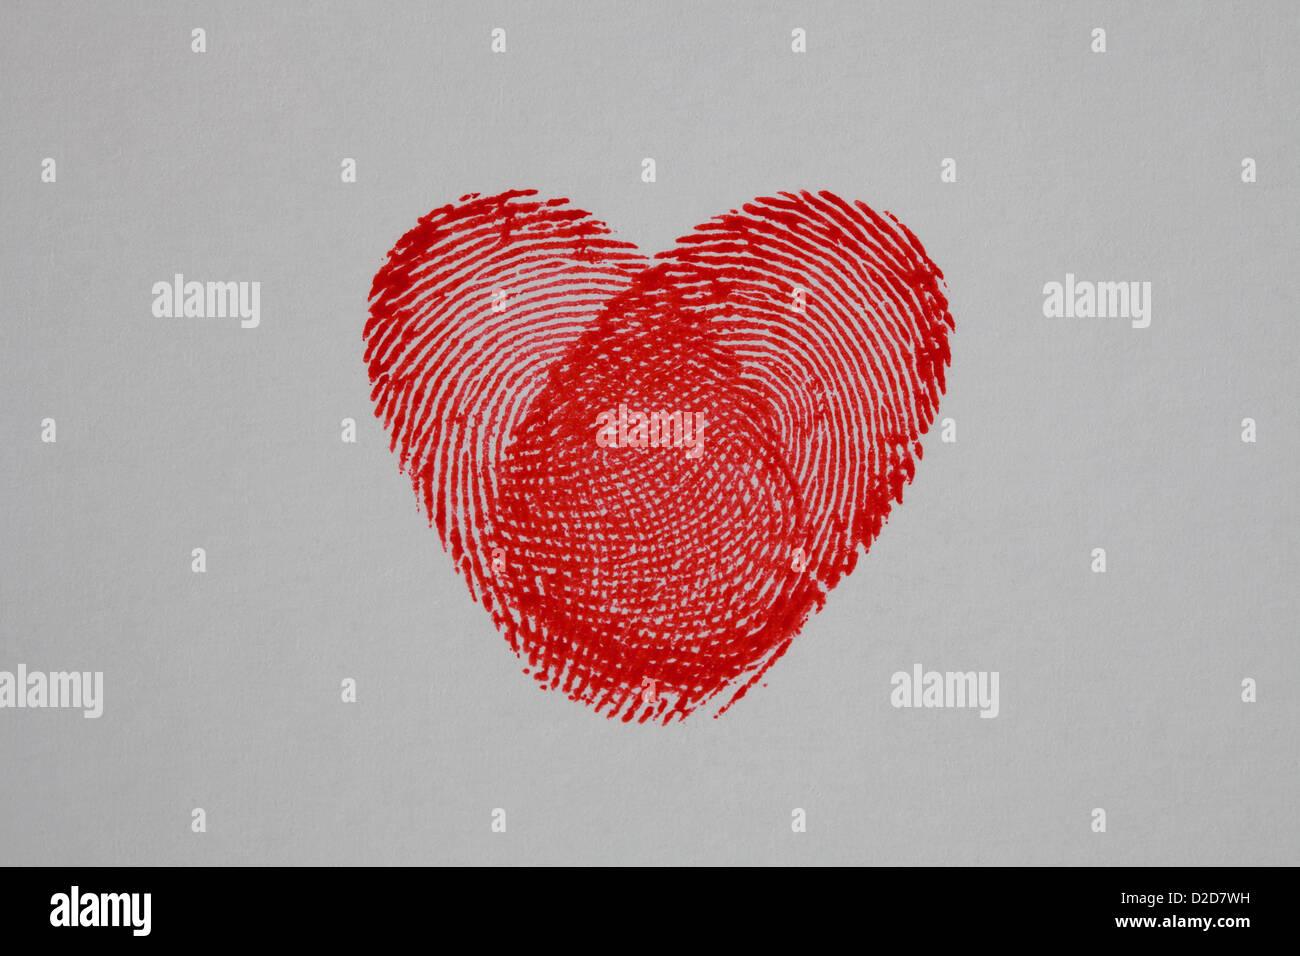 Fingerabdruck Herz Stockfoto Bild 53151997 Alamy